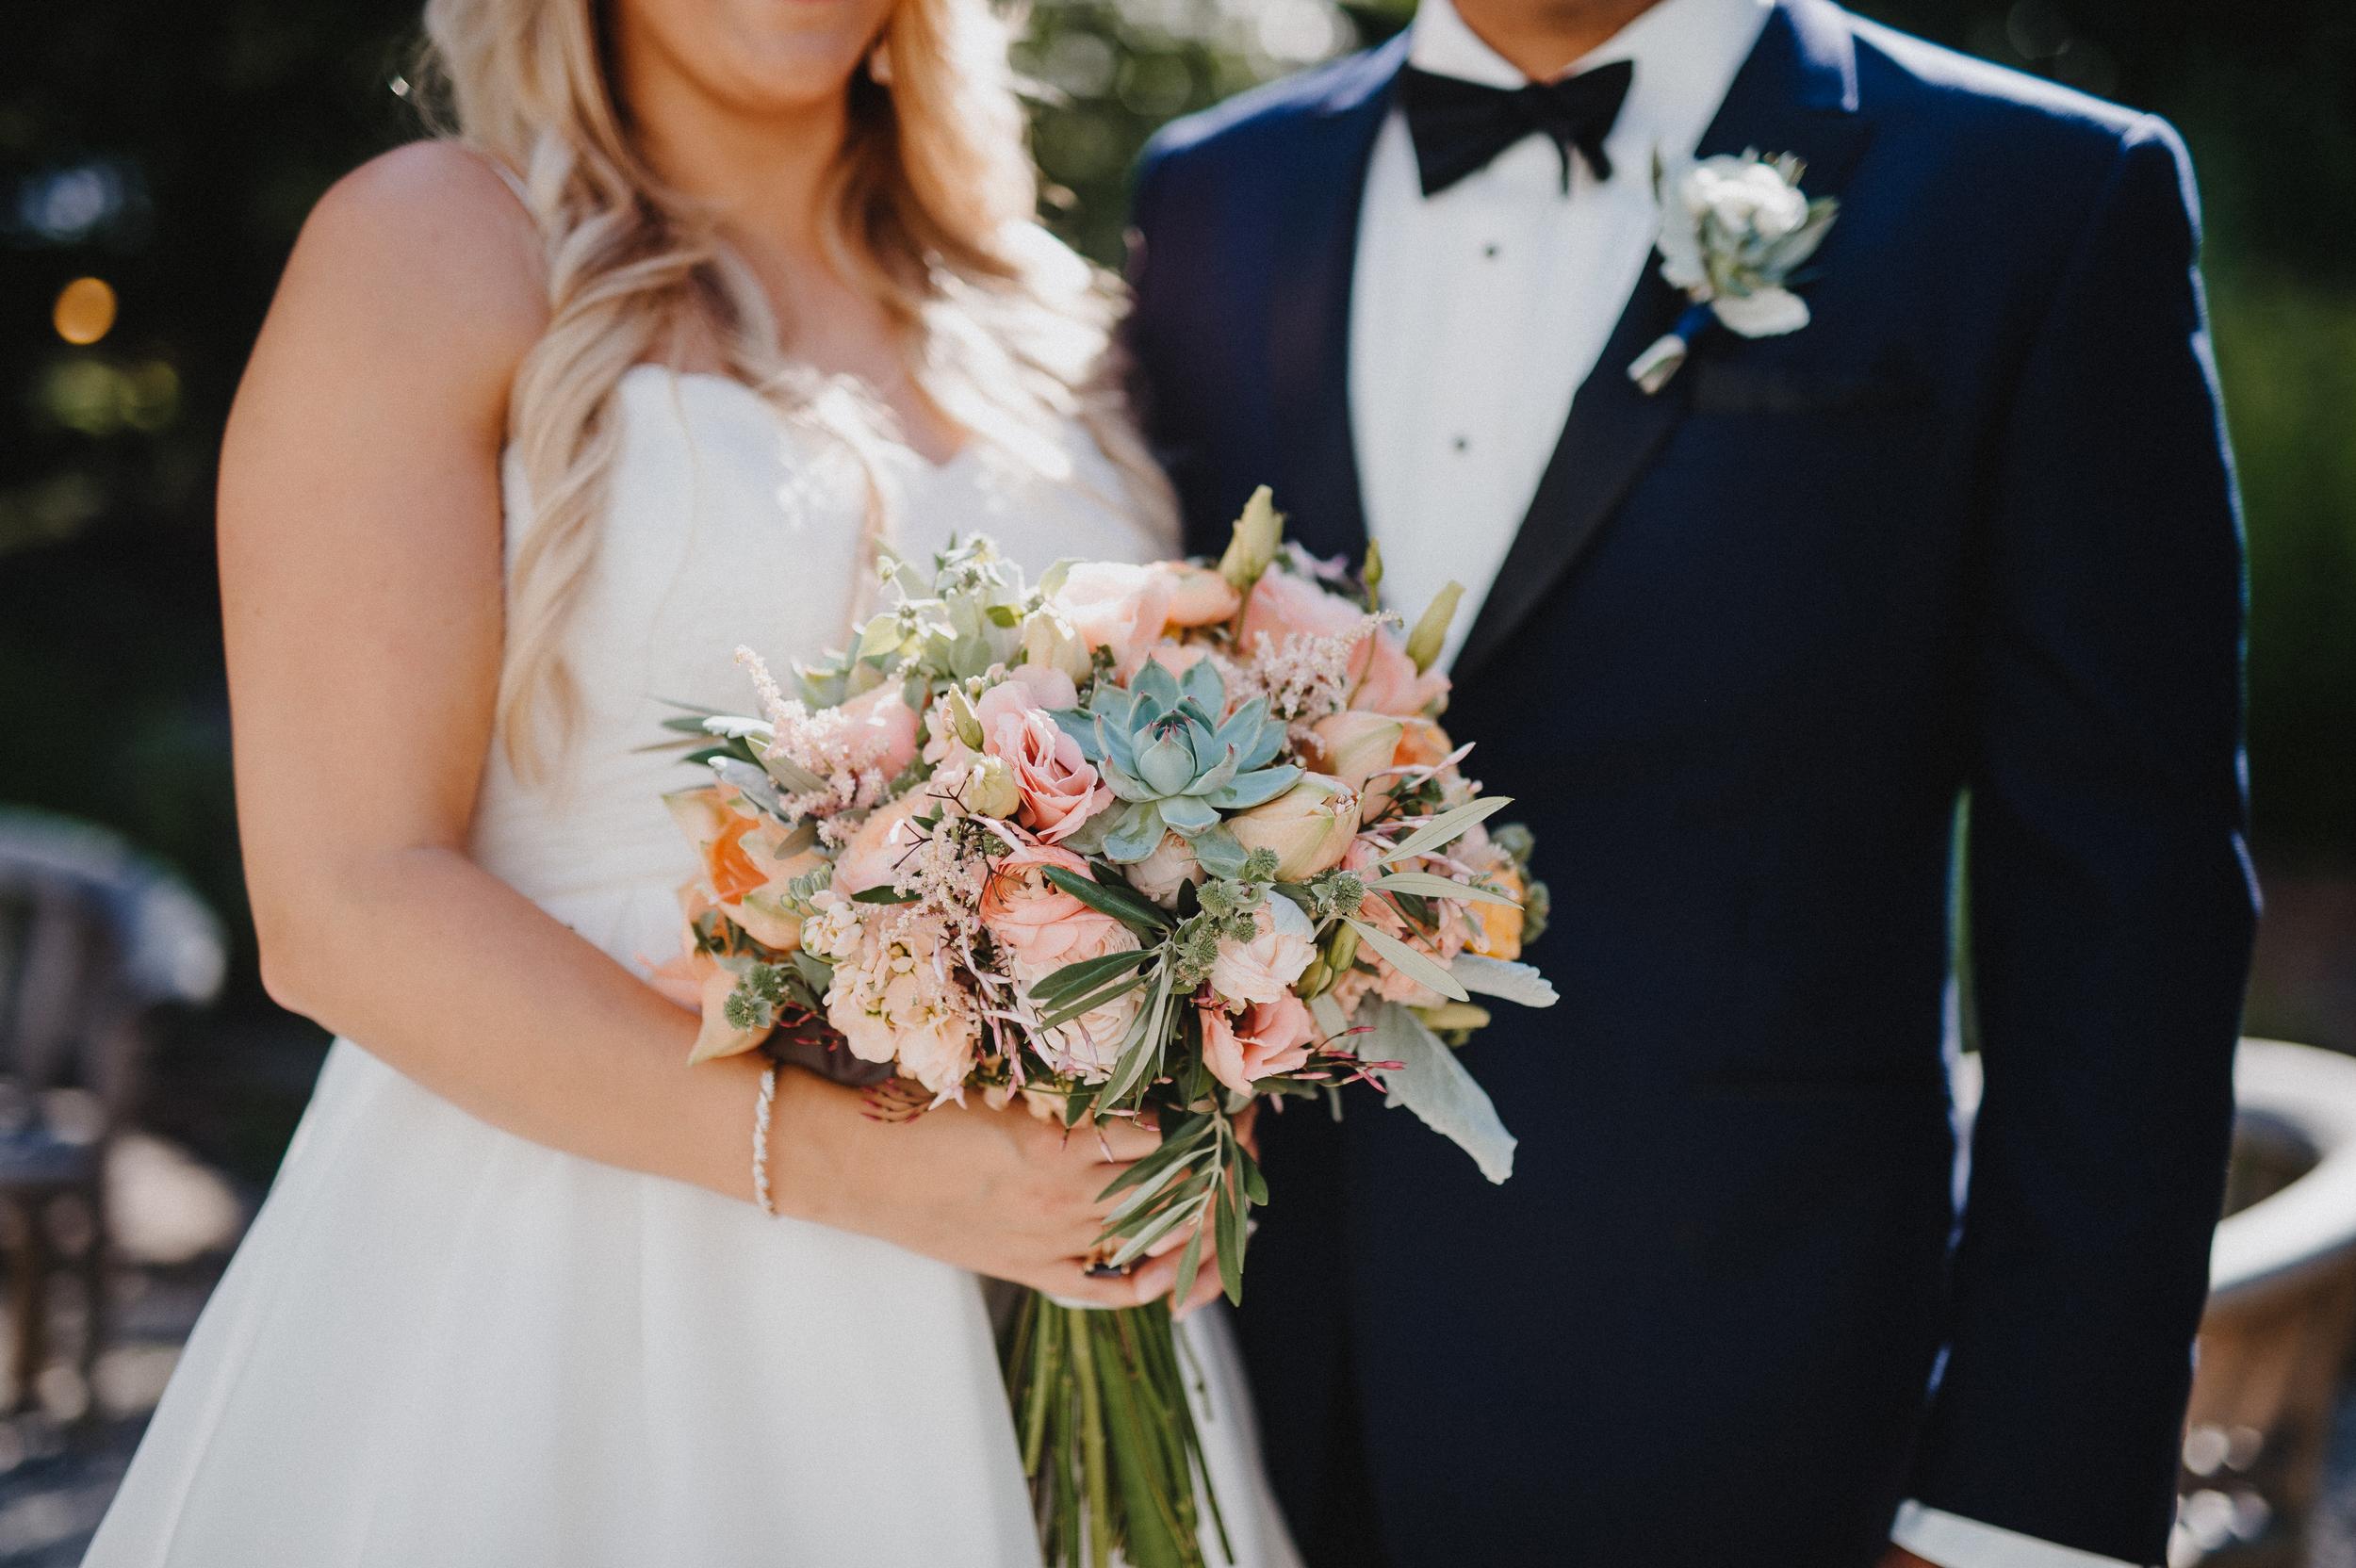 holly-hedge-estate-wedding-photographer-pat-robinson-photography-45.jpg